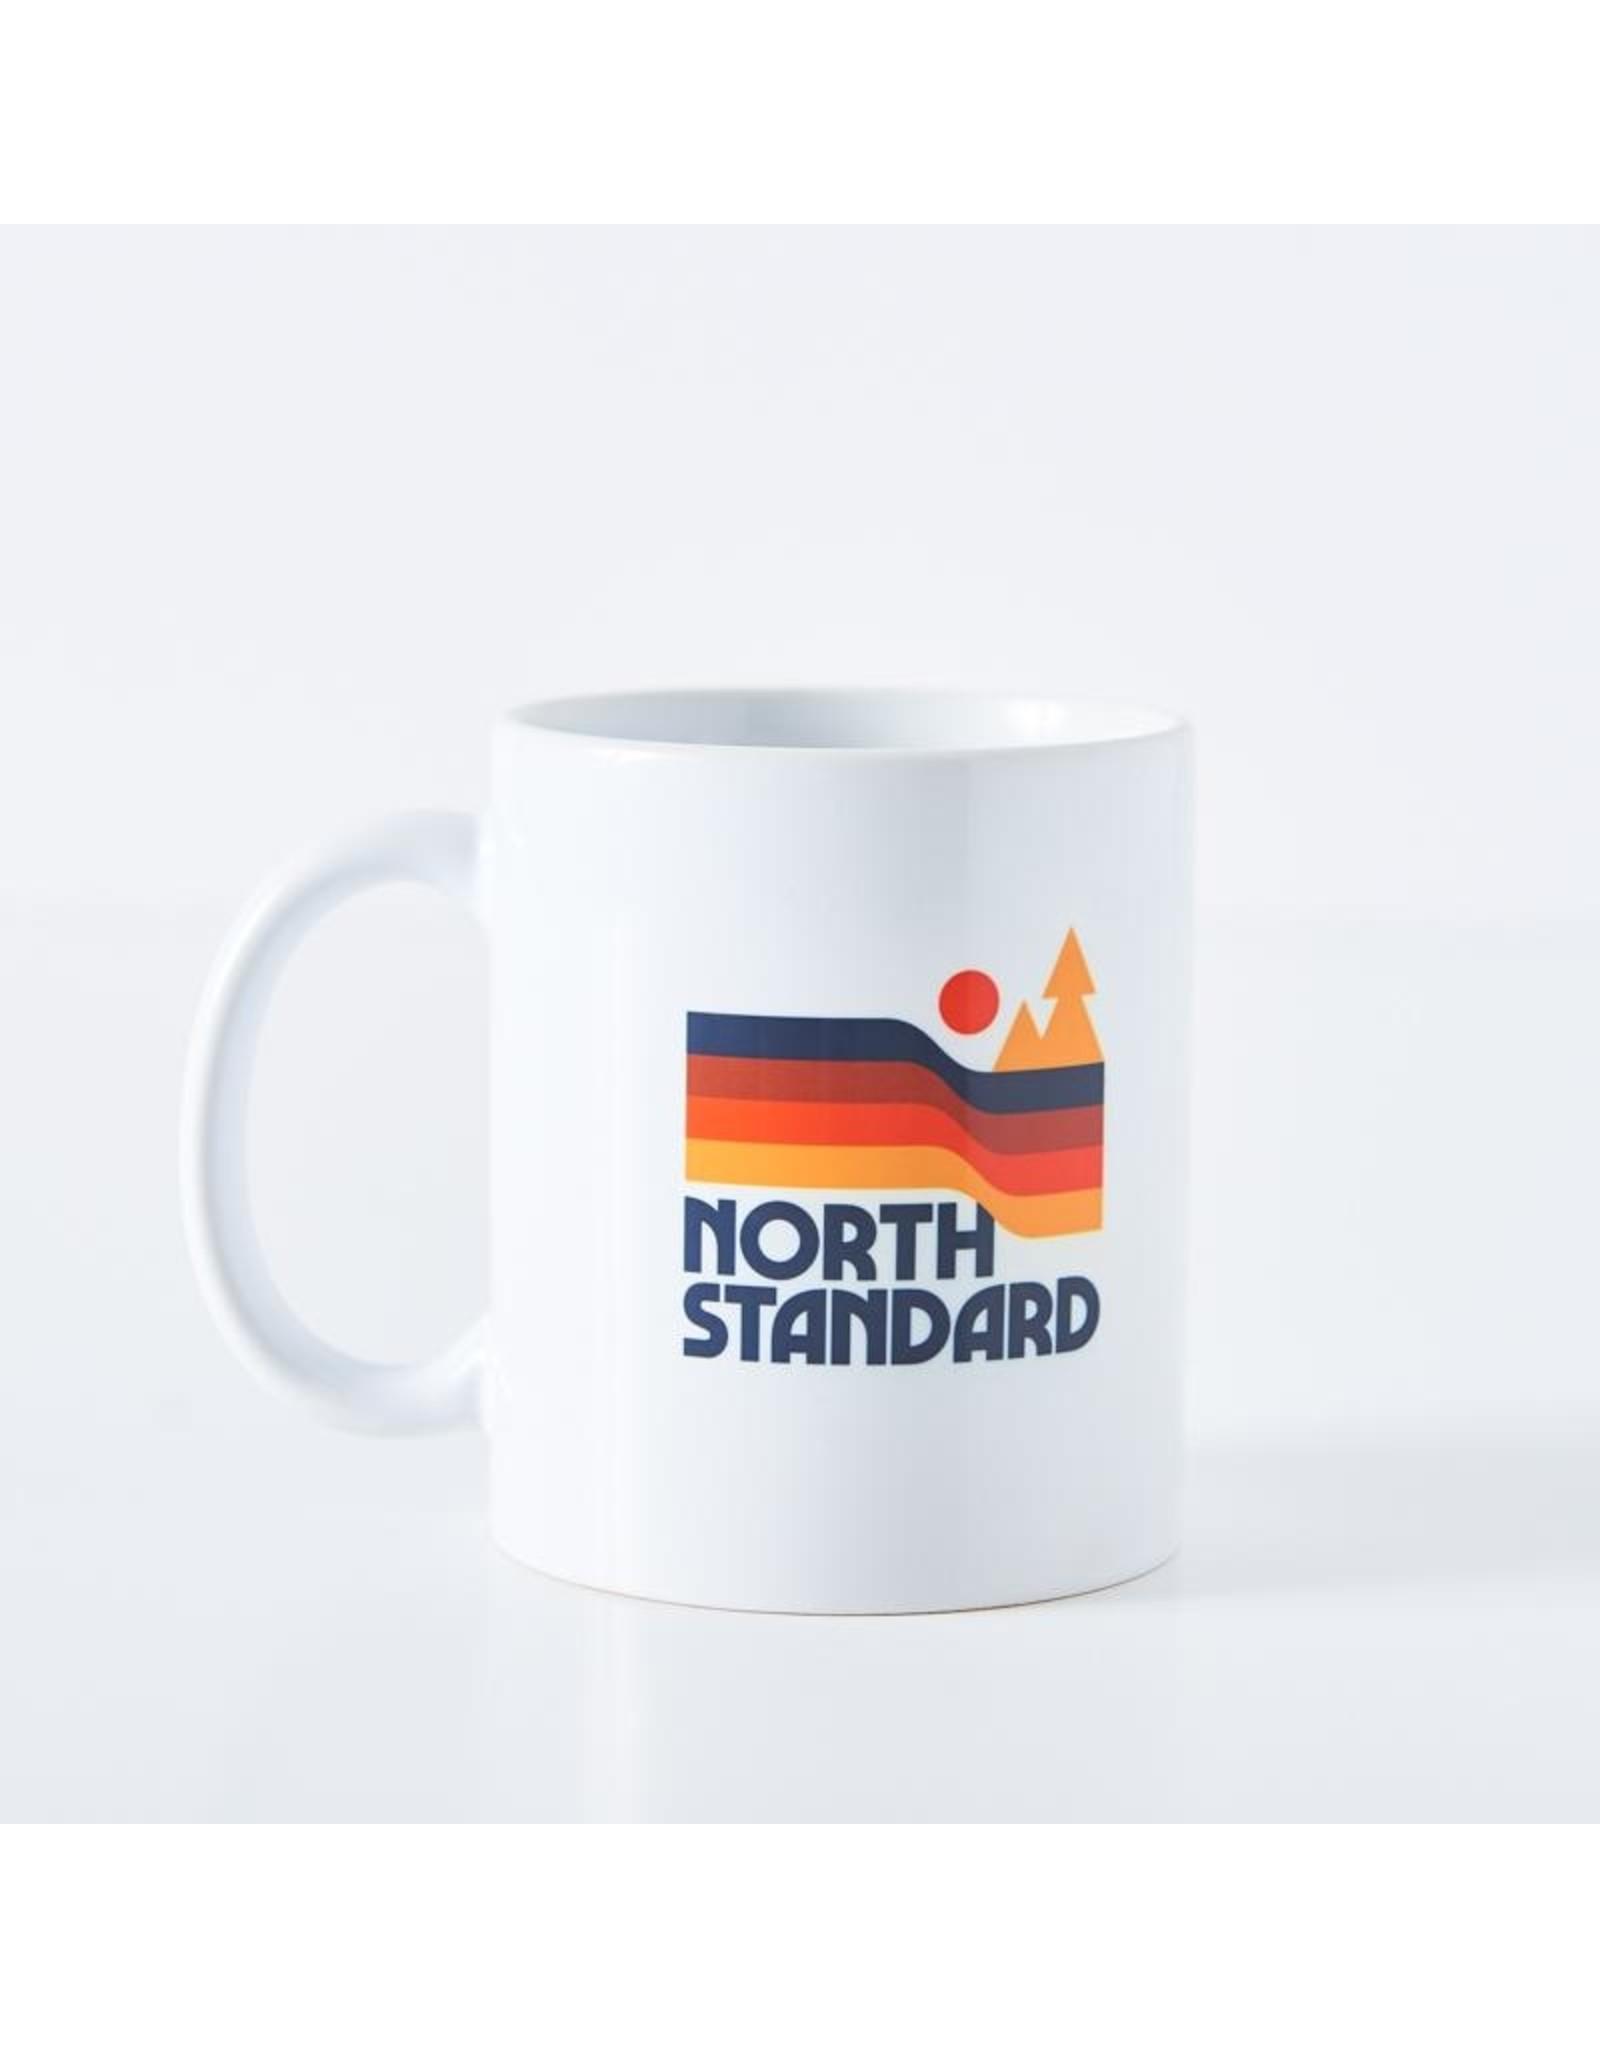 North Standard - Mug Waves